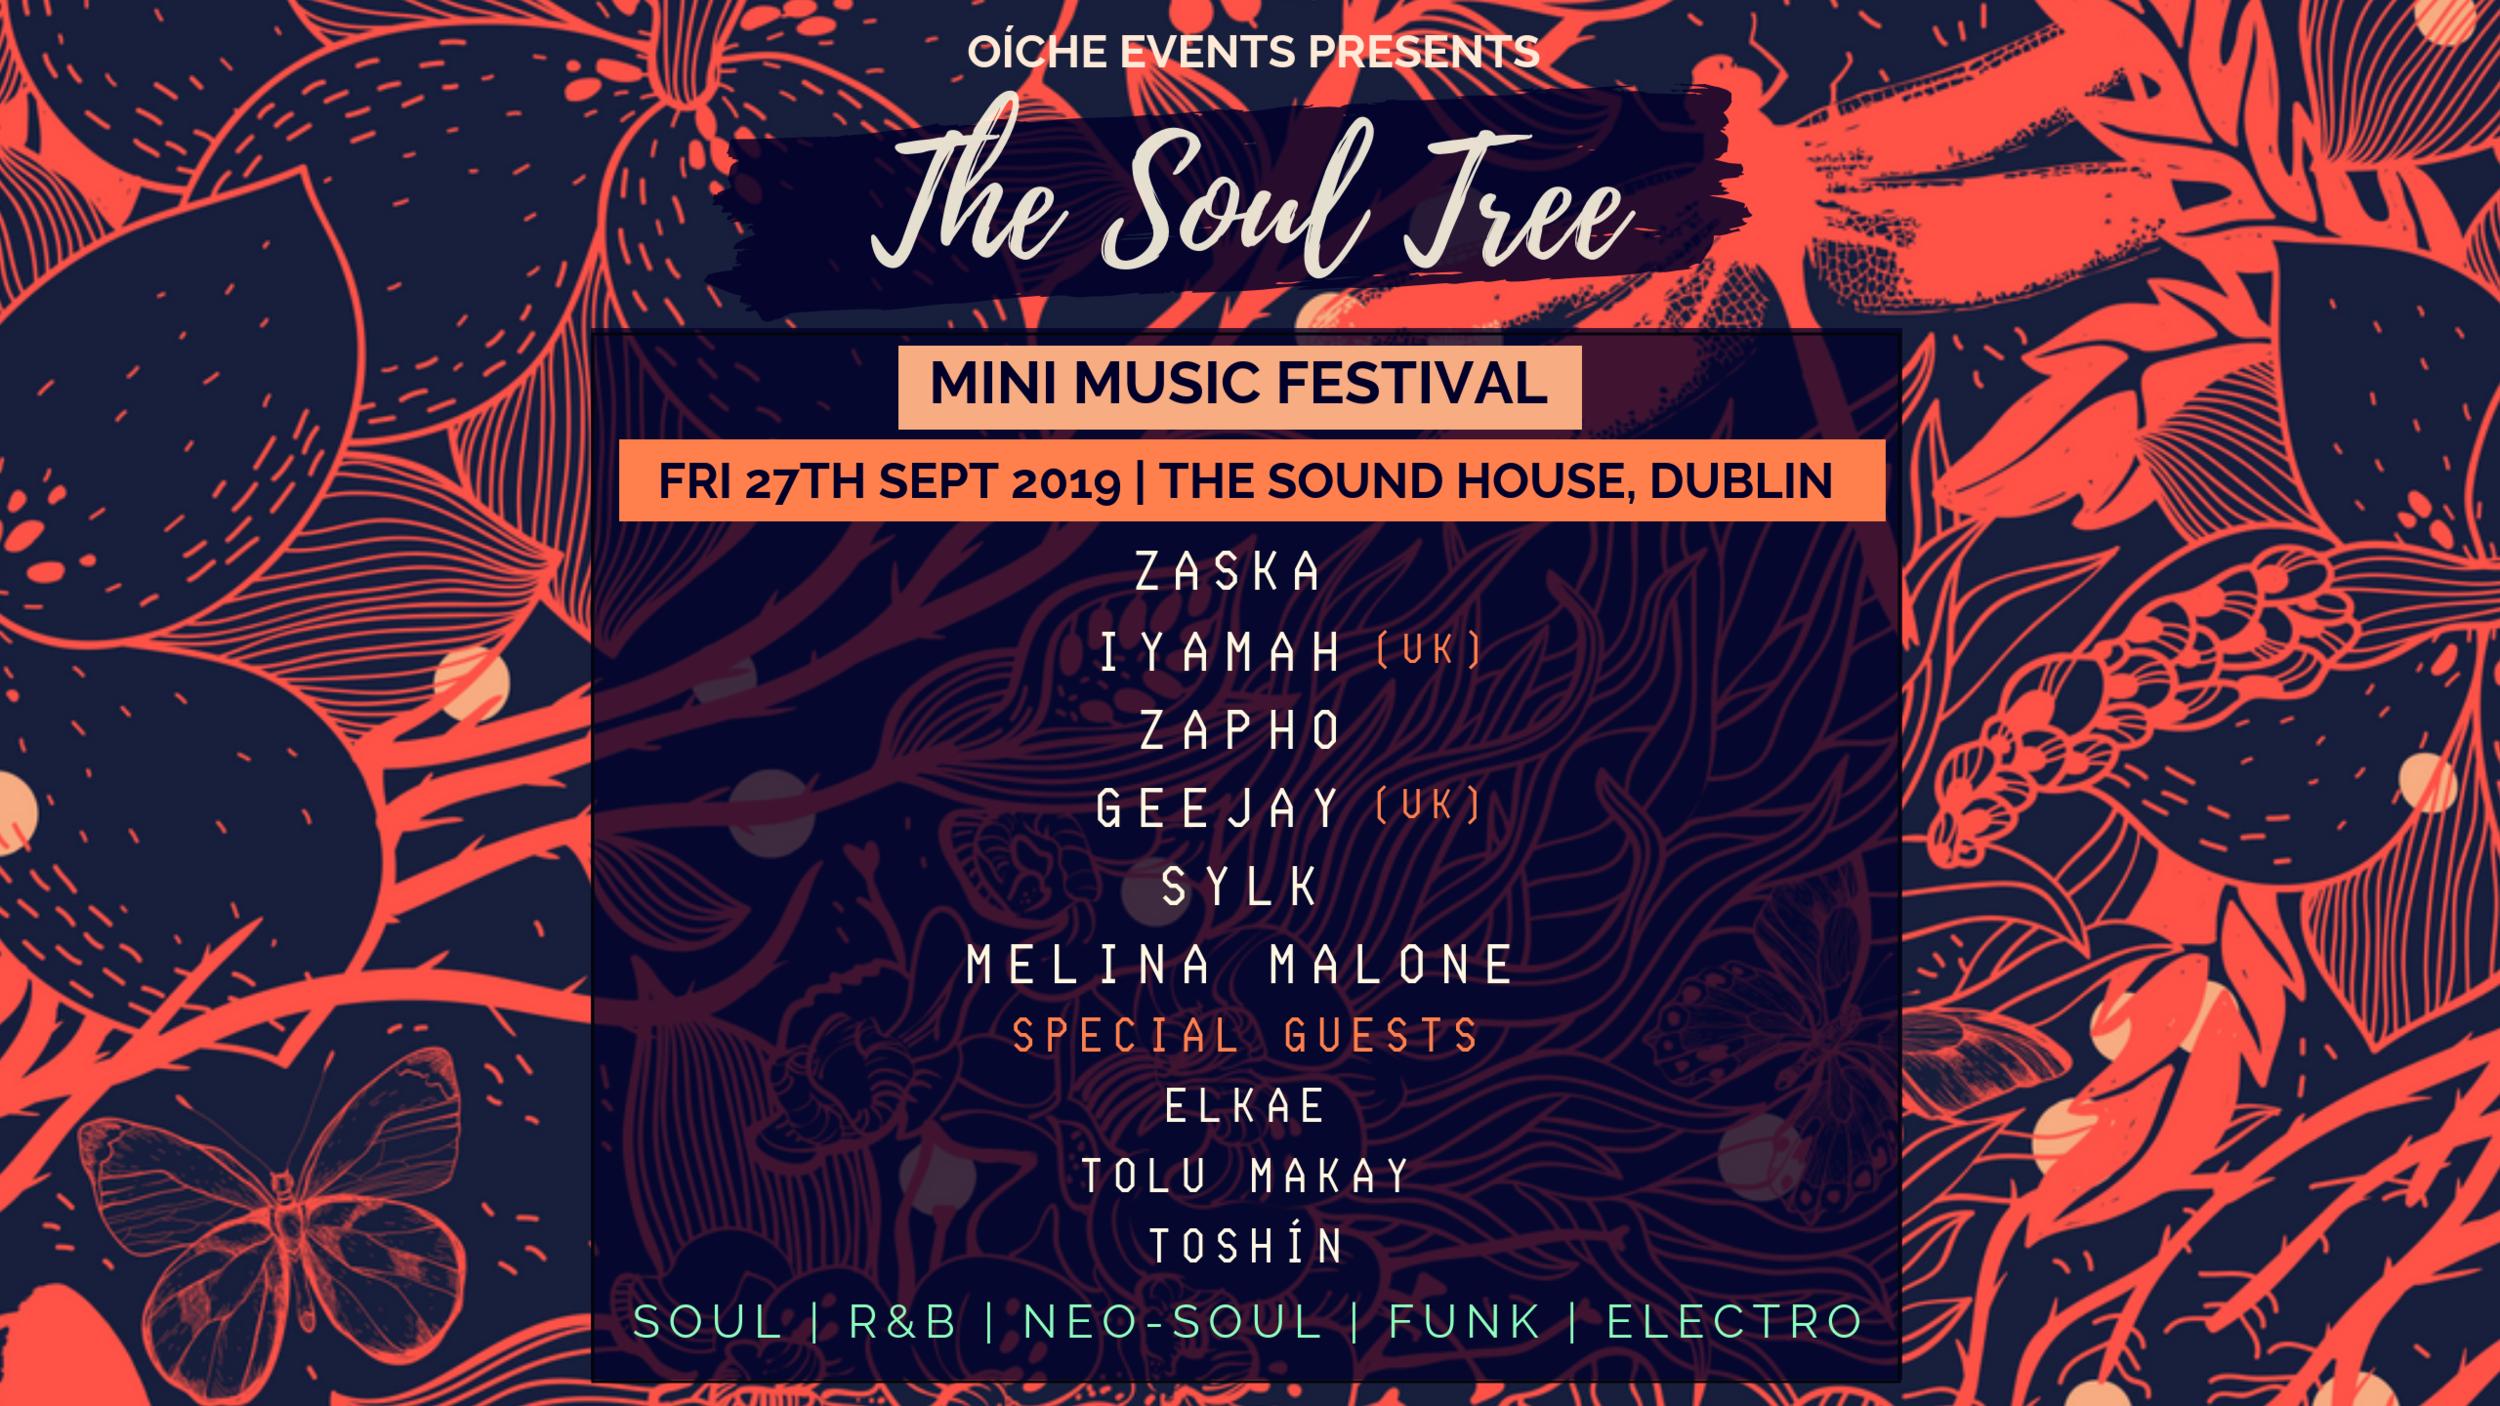 The Soul Tree Mini Music Festival Dublin